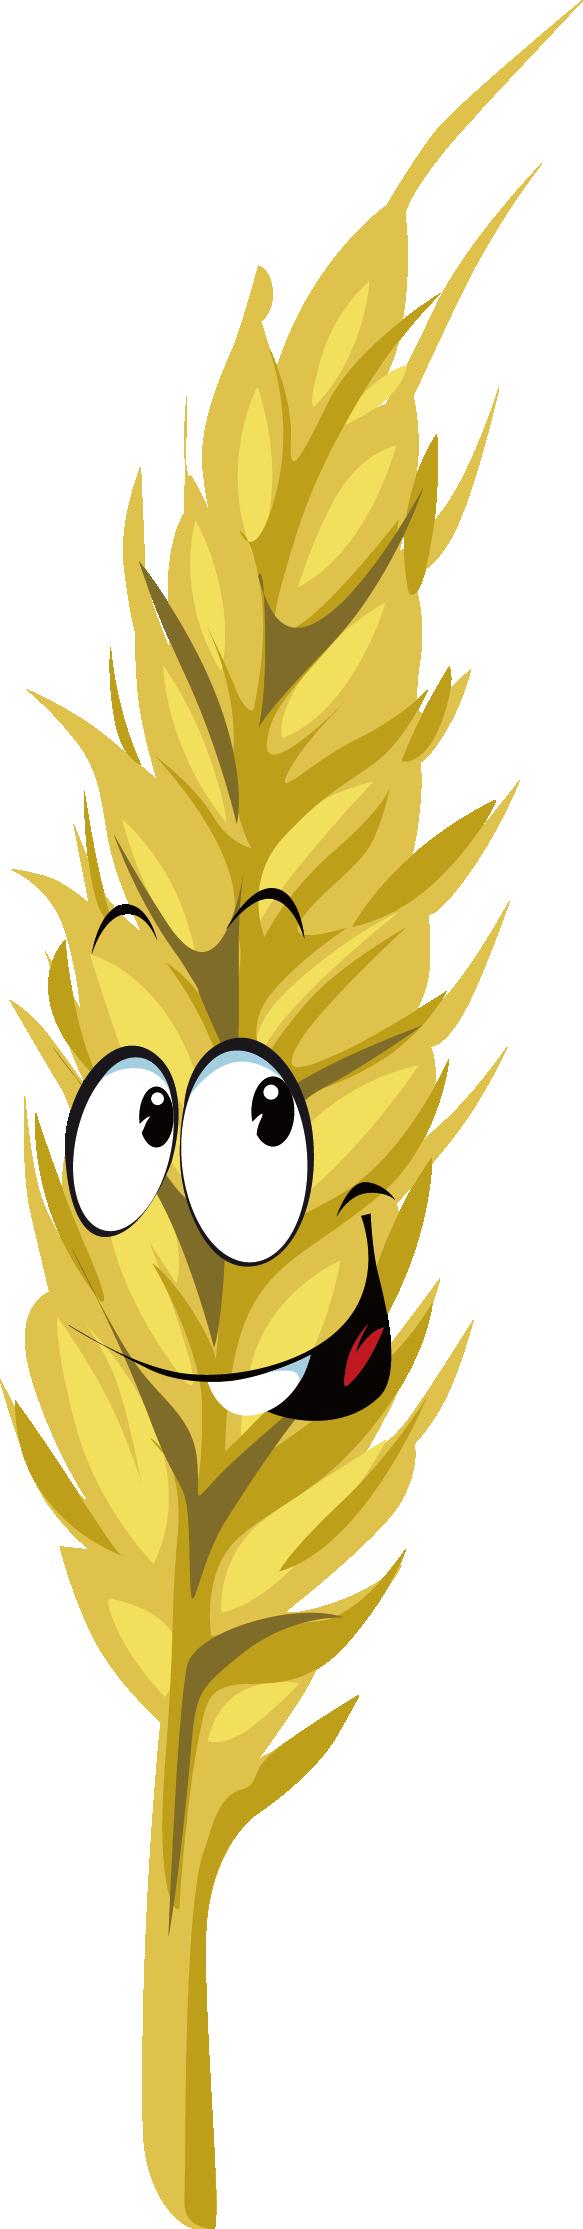 Wheat clipart wheat head. Cartoon drawing royalty free